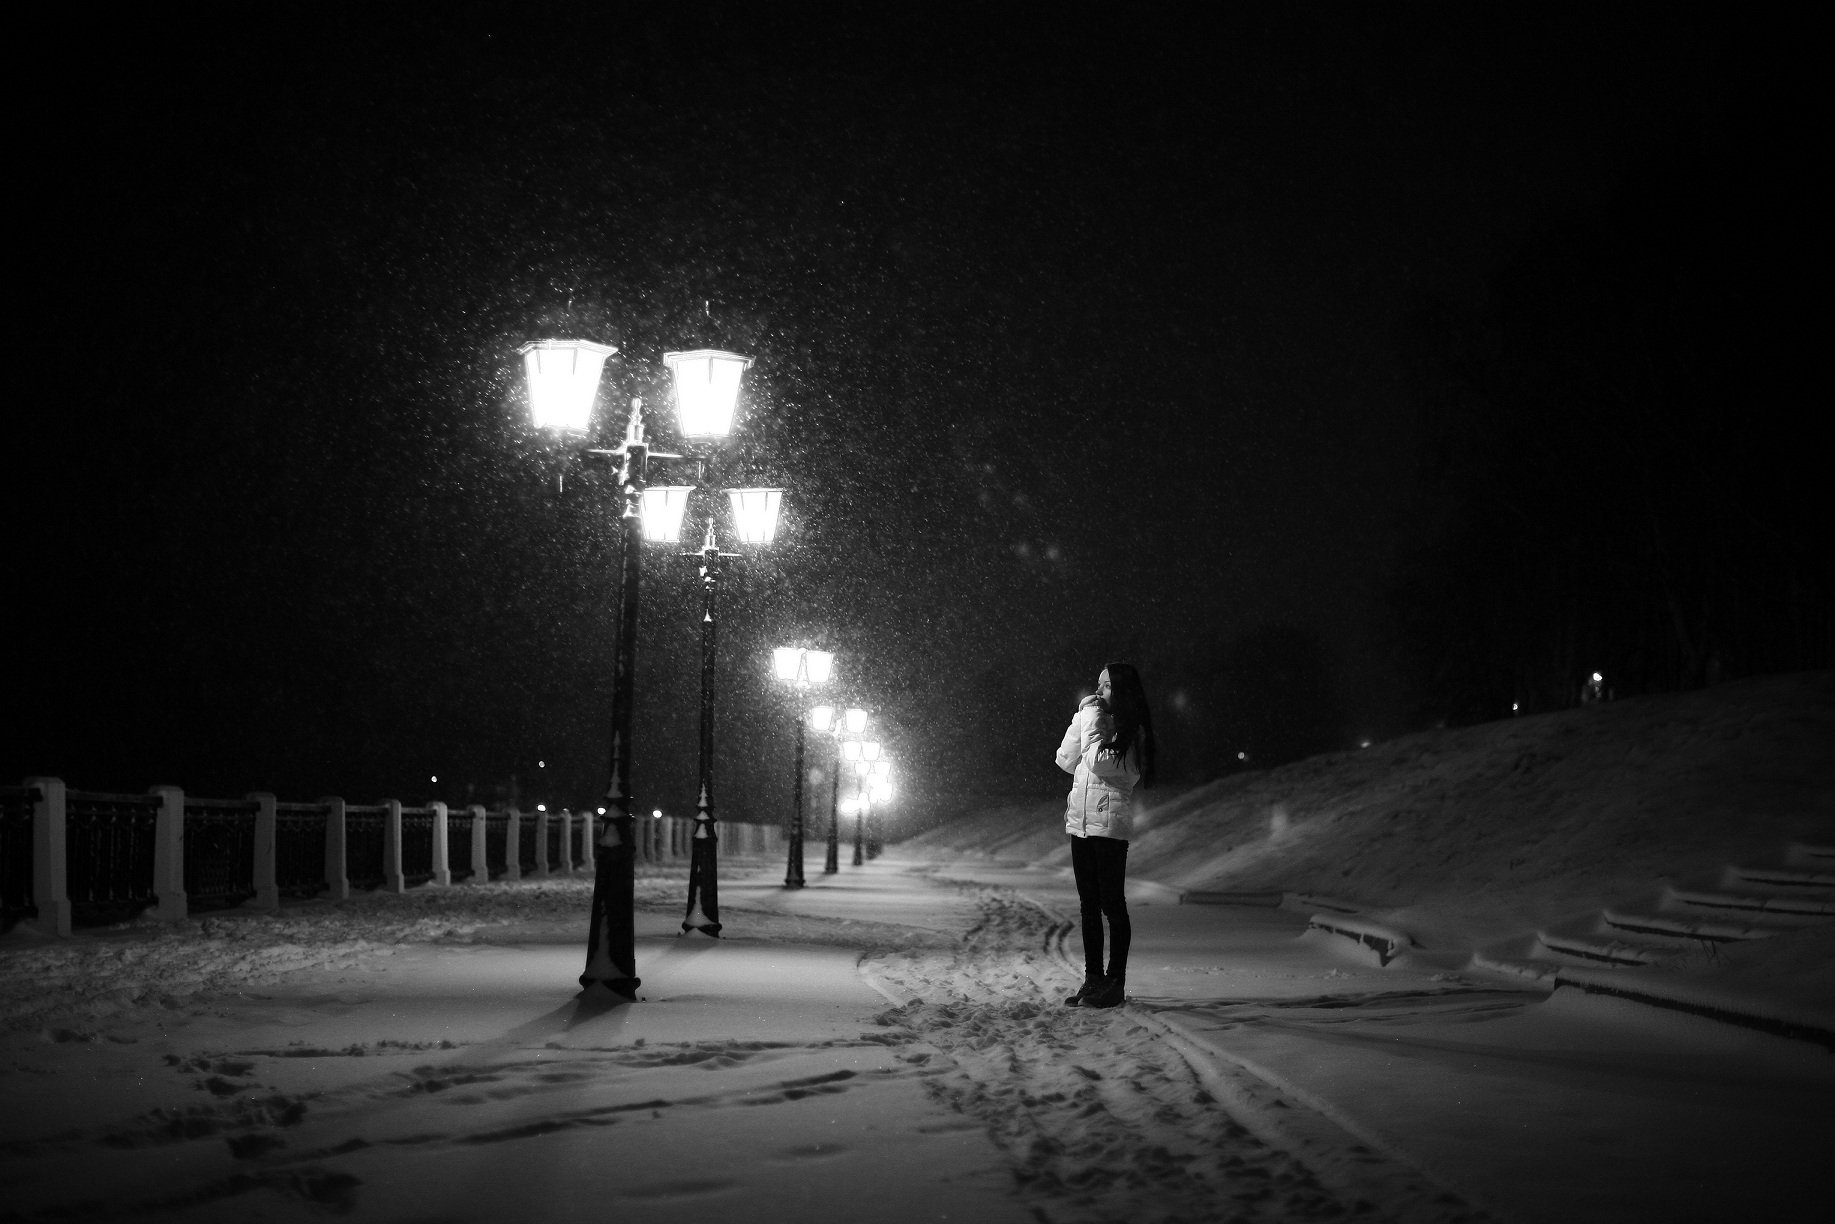 canon, 50mm 1.2, winter, Stark Anthony